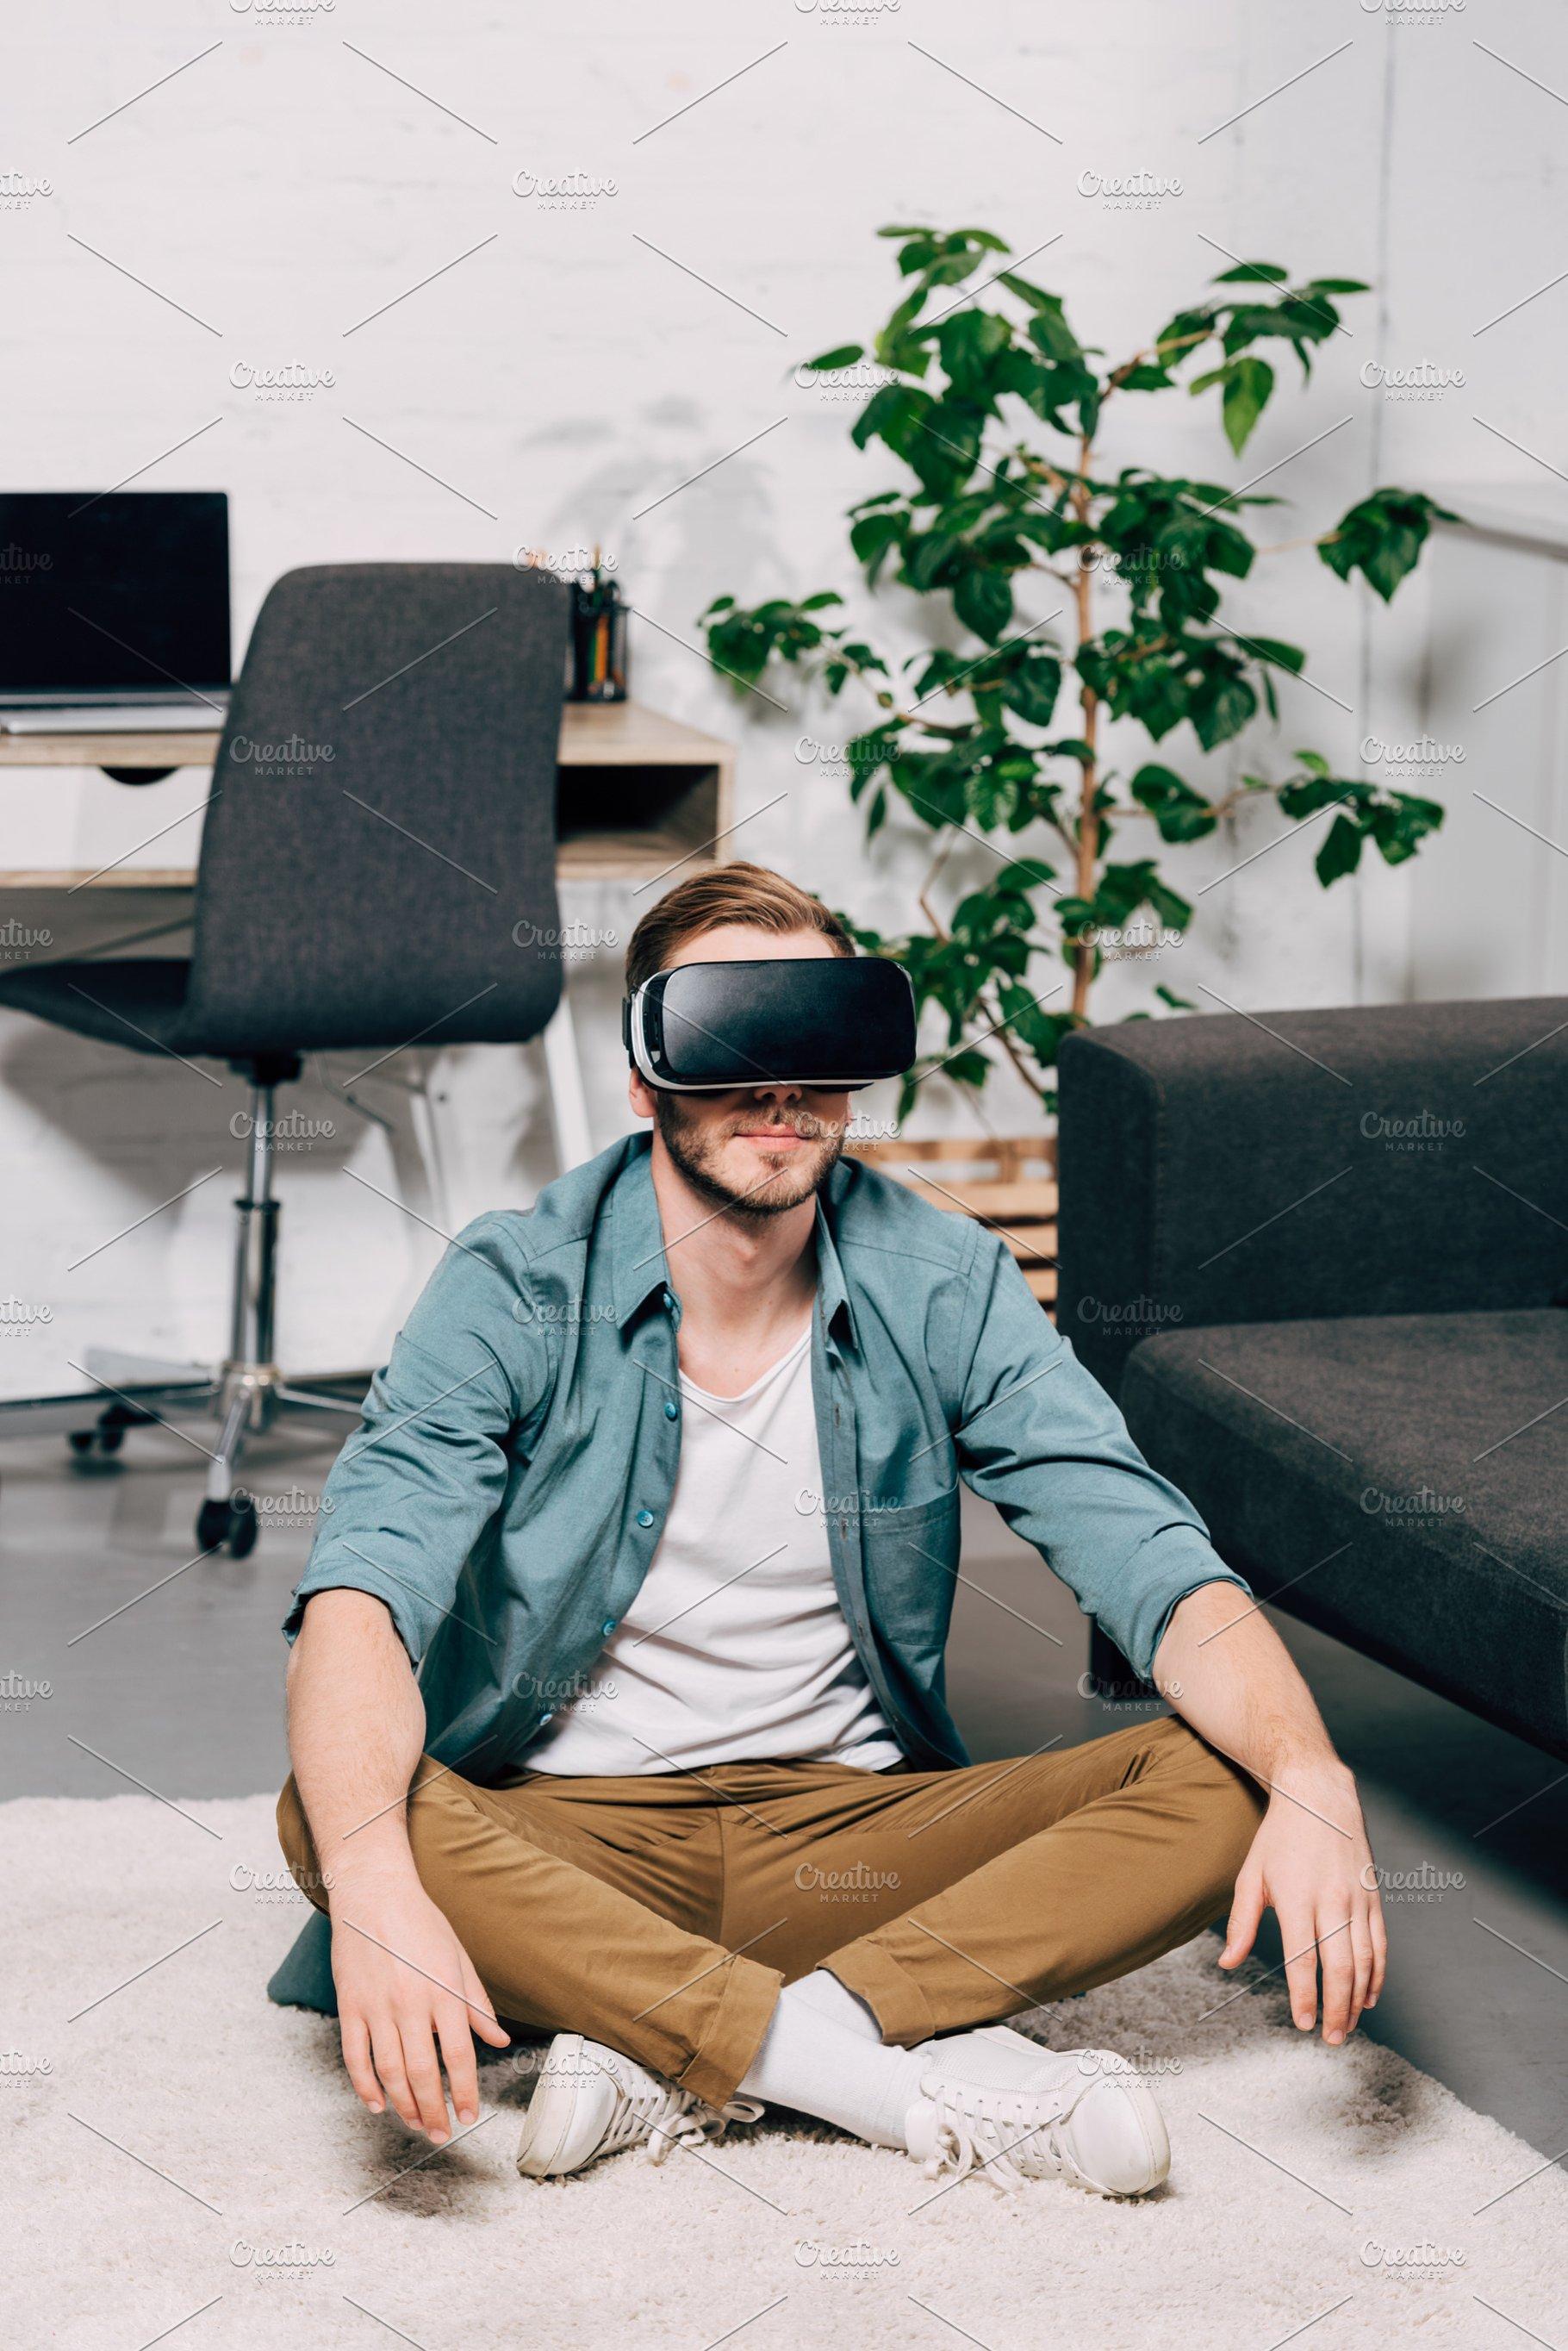 af71b6cc423e young man using virtual reality head ~ People Photos ~ Creative Market